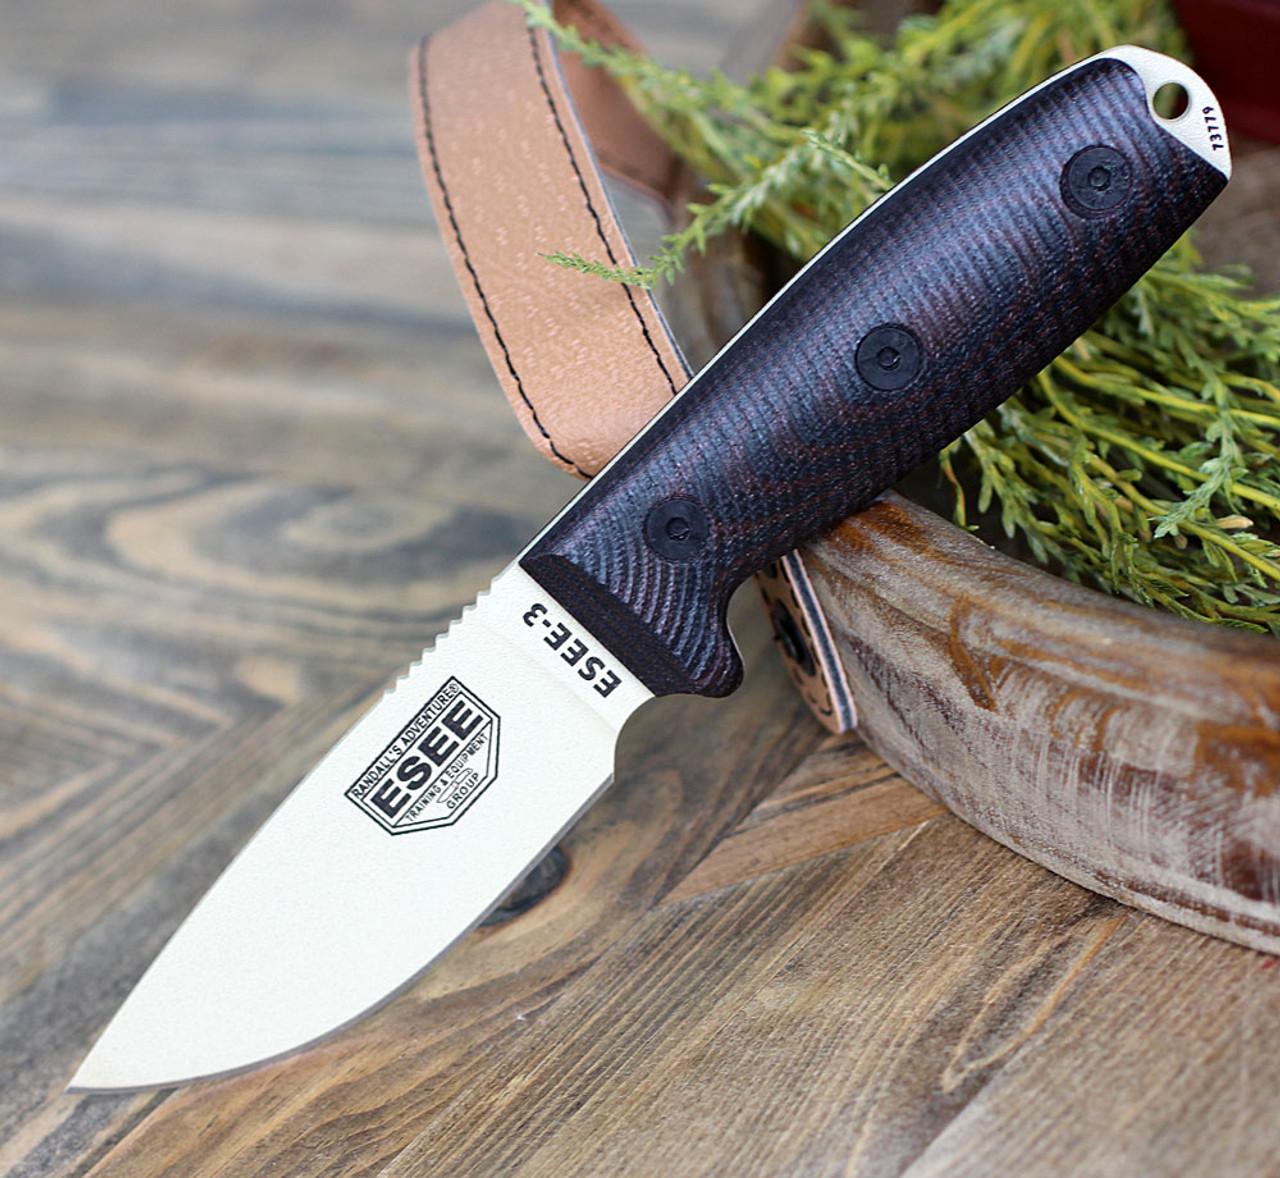 "ESEE-3 3PMDT-004, 3.88"" 1095 Carbon Steel DT Plain Blade, Blood/Black G10 3D Handle, Black Sheath"